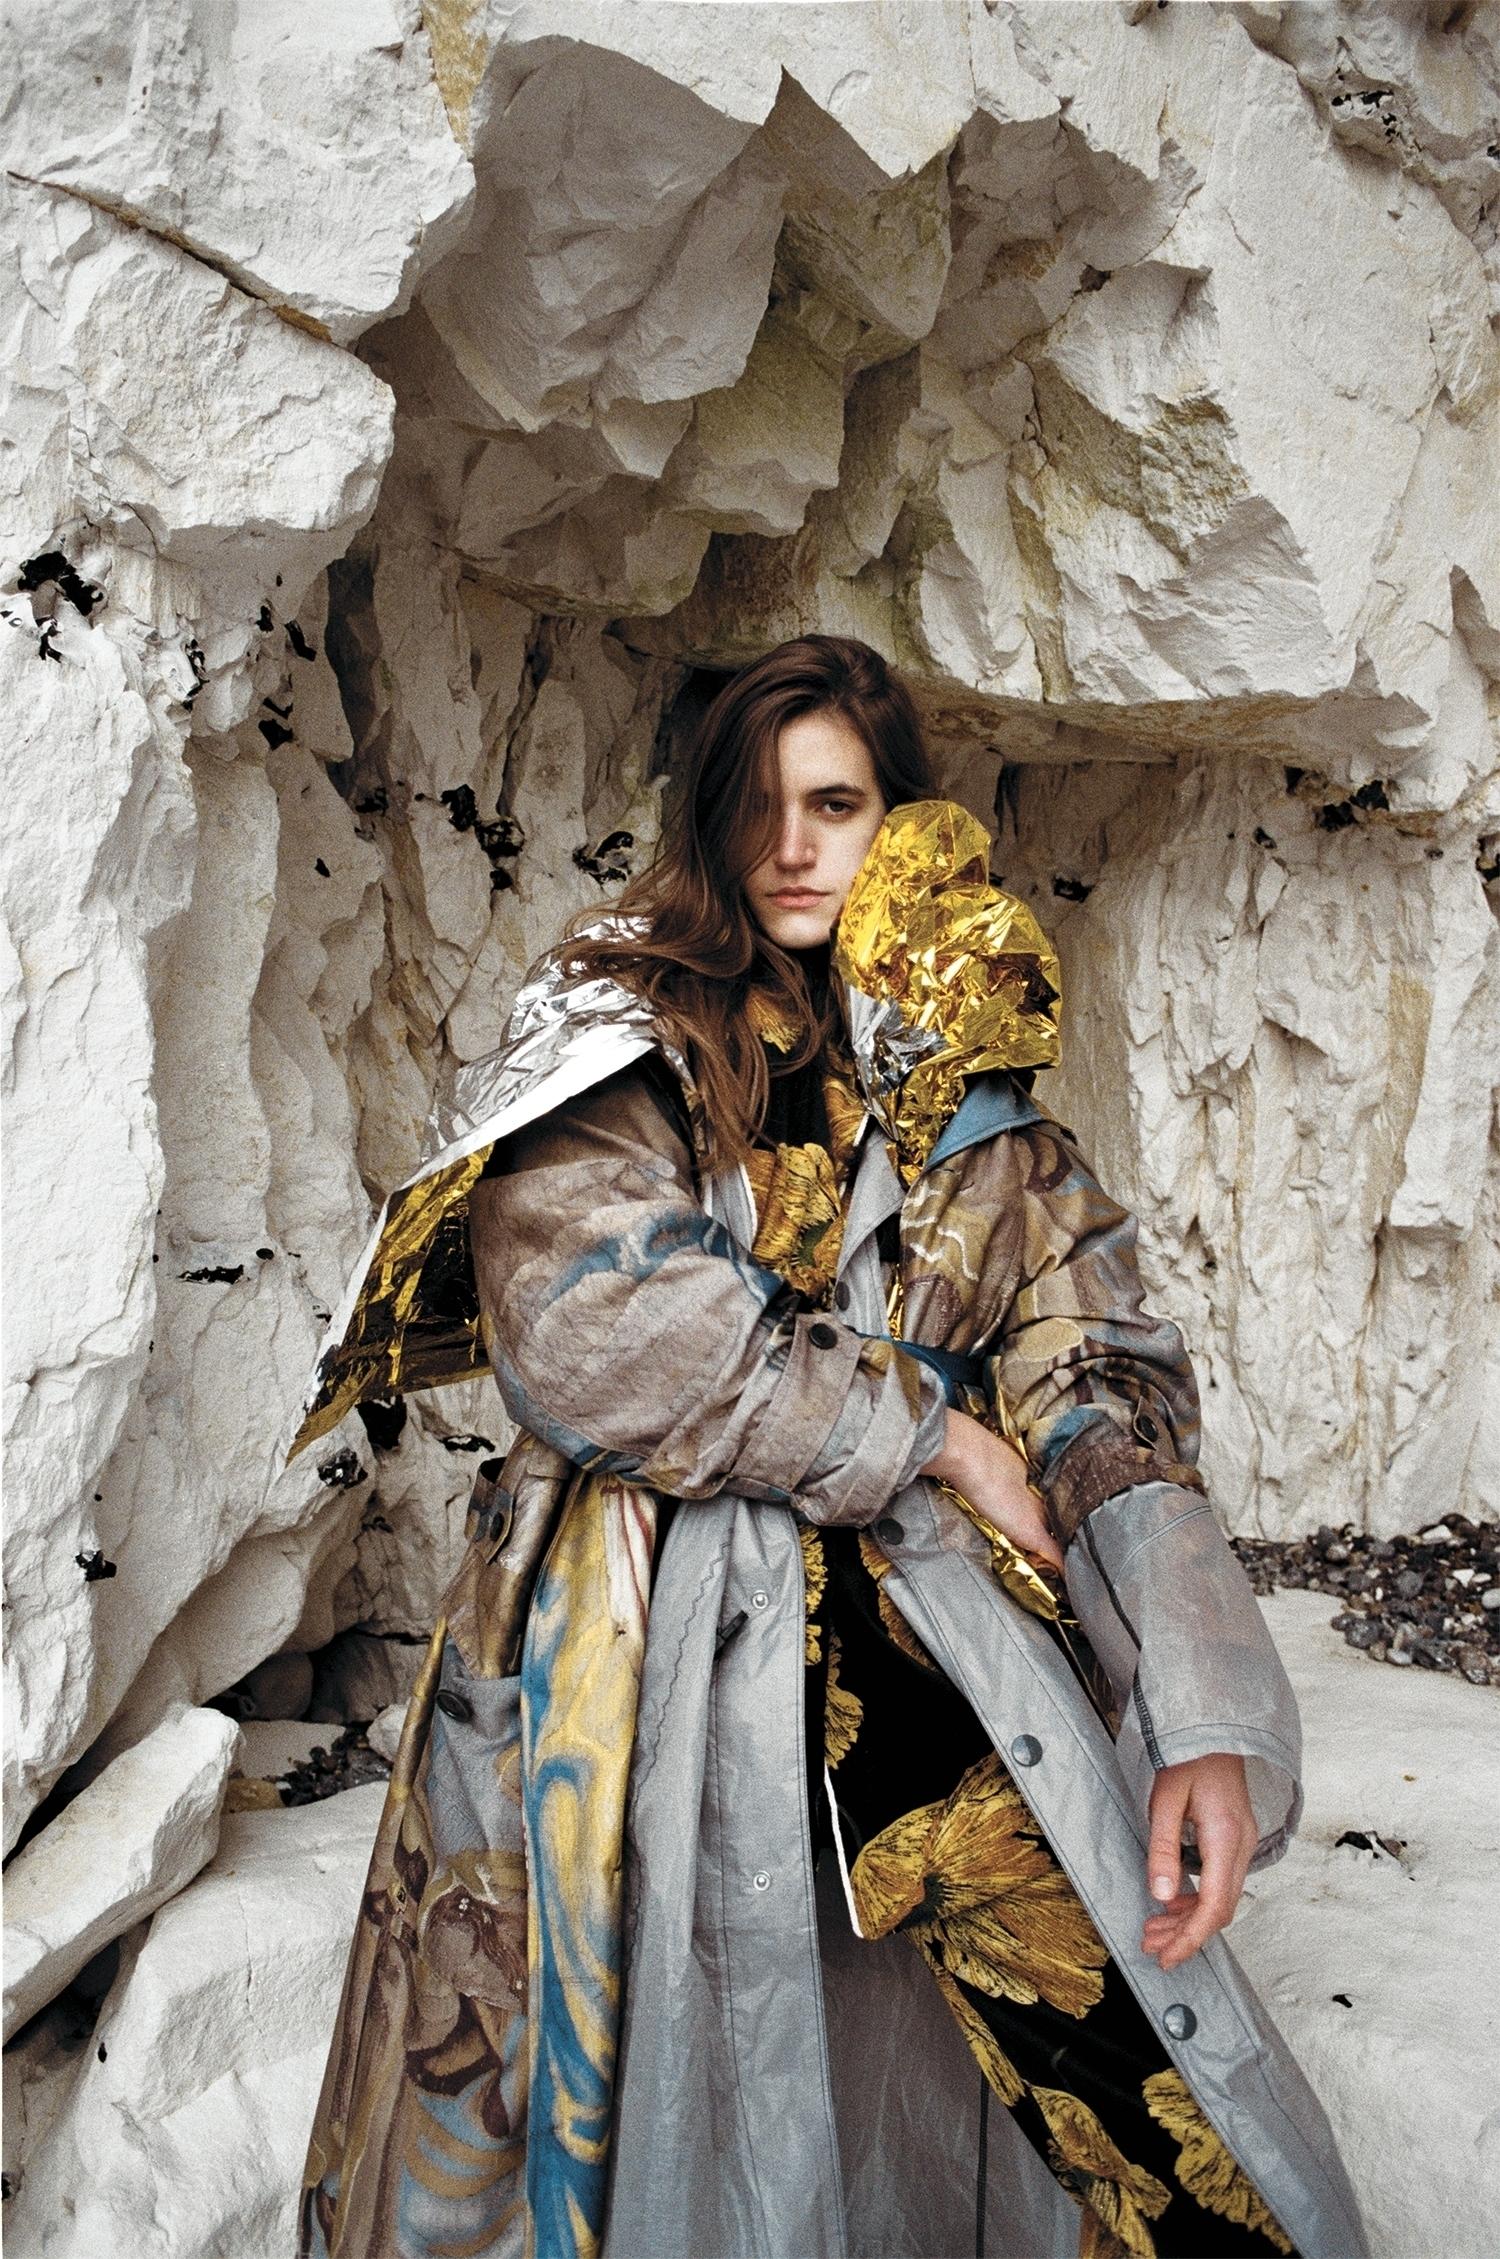 Printed parka by Dries Van Noten, coat by Prada, printed suit by Gucci.